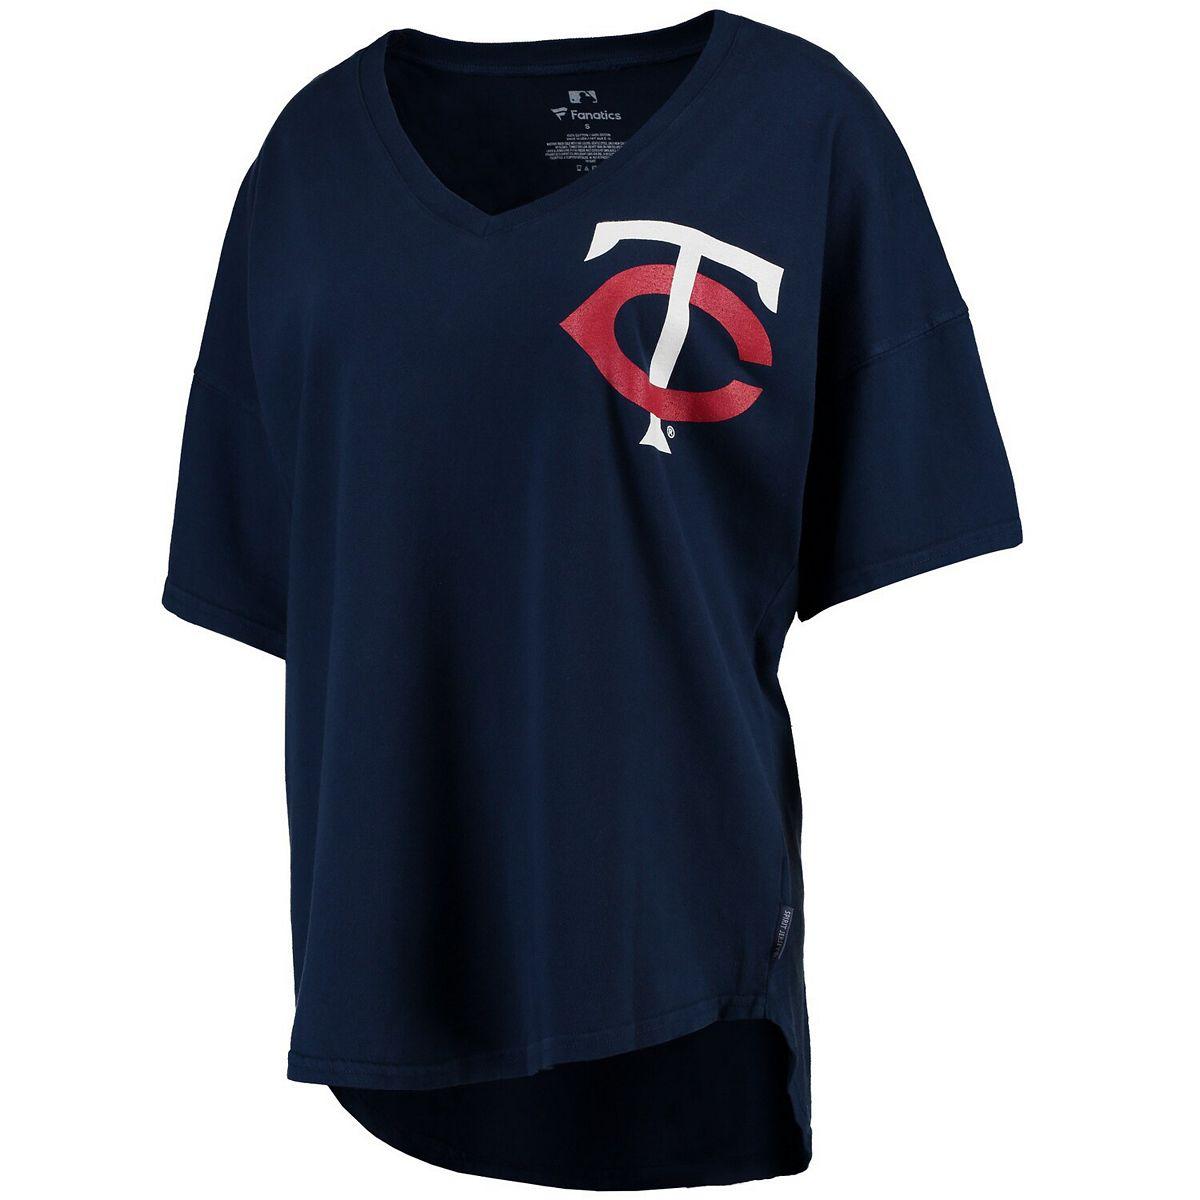 Women's Navy Minnesota Twins Oversized Spirit Jersey V-Neck T-Shirt HyI0d